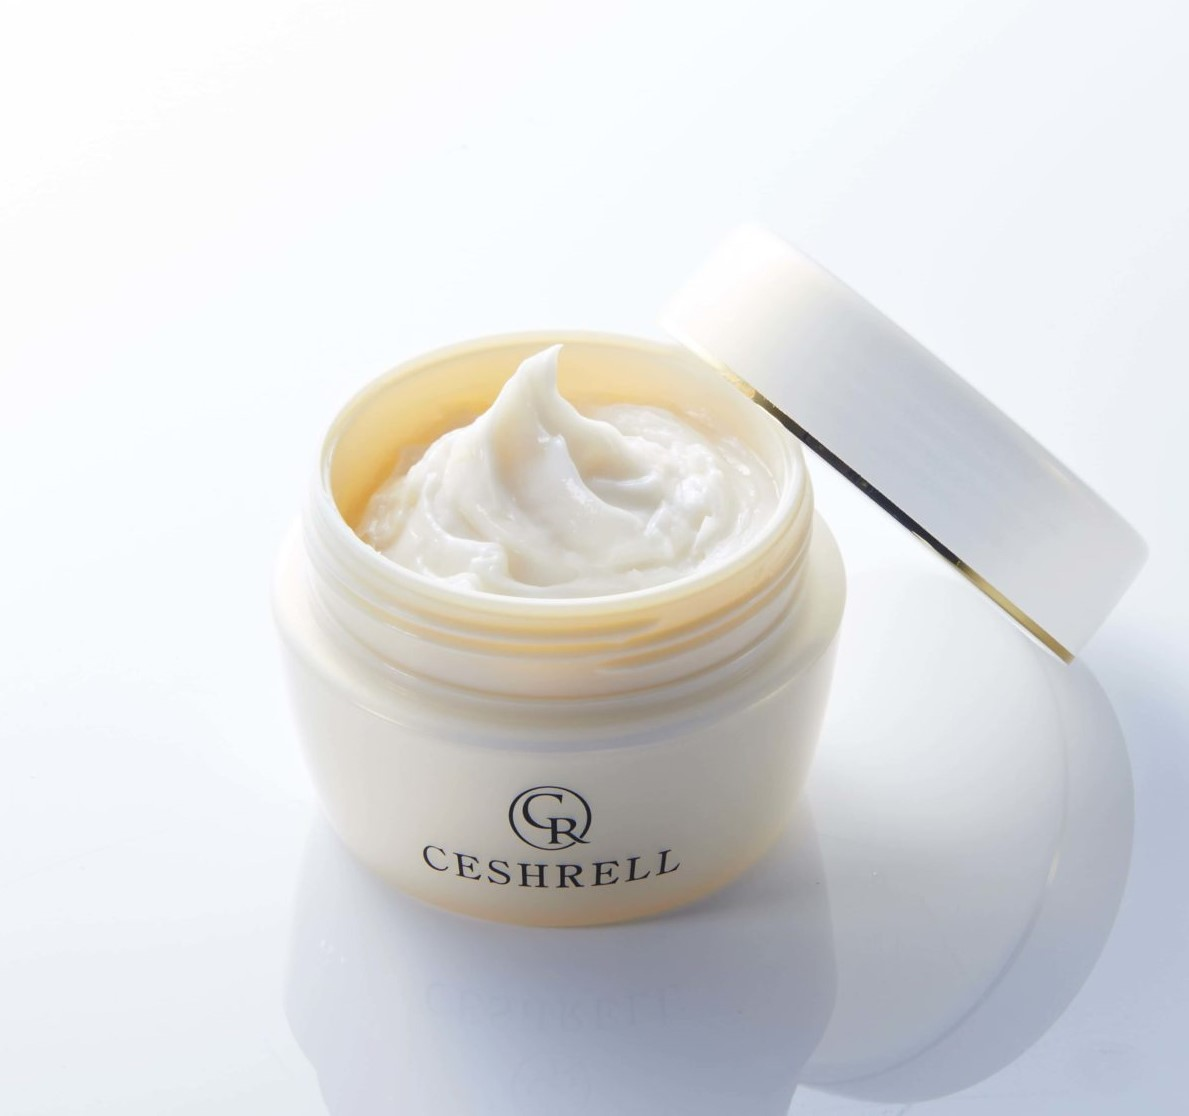 CESHRELL(セシュレル) | リアルビューティーケア(Real Beauty Care)公式